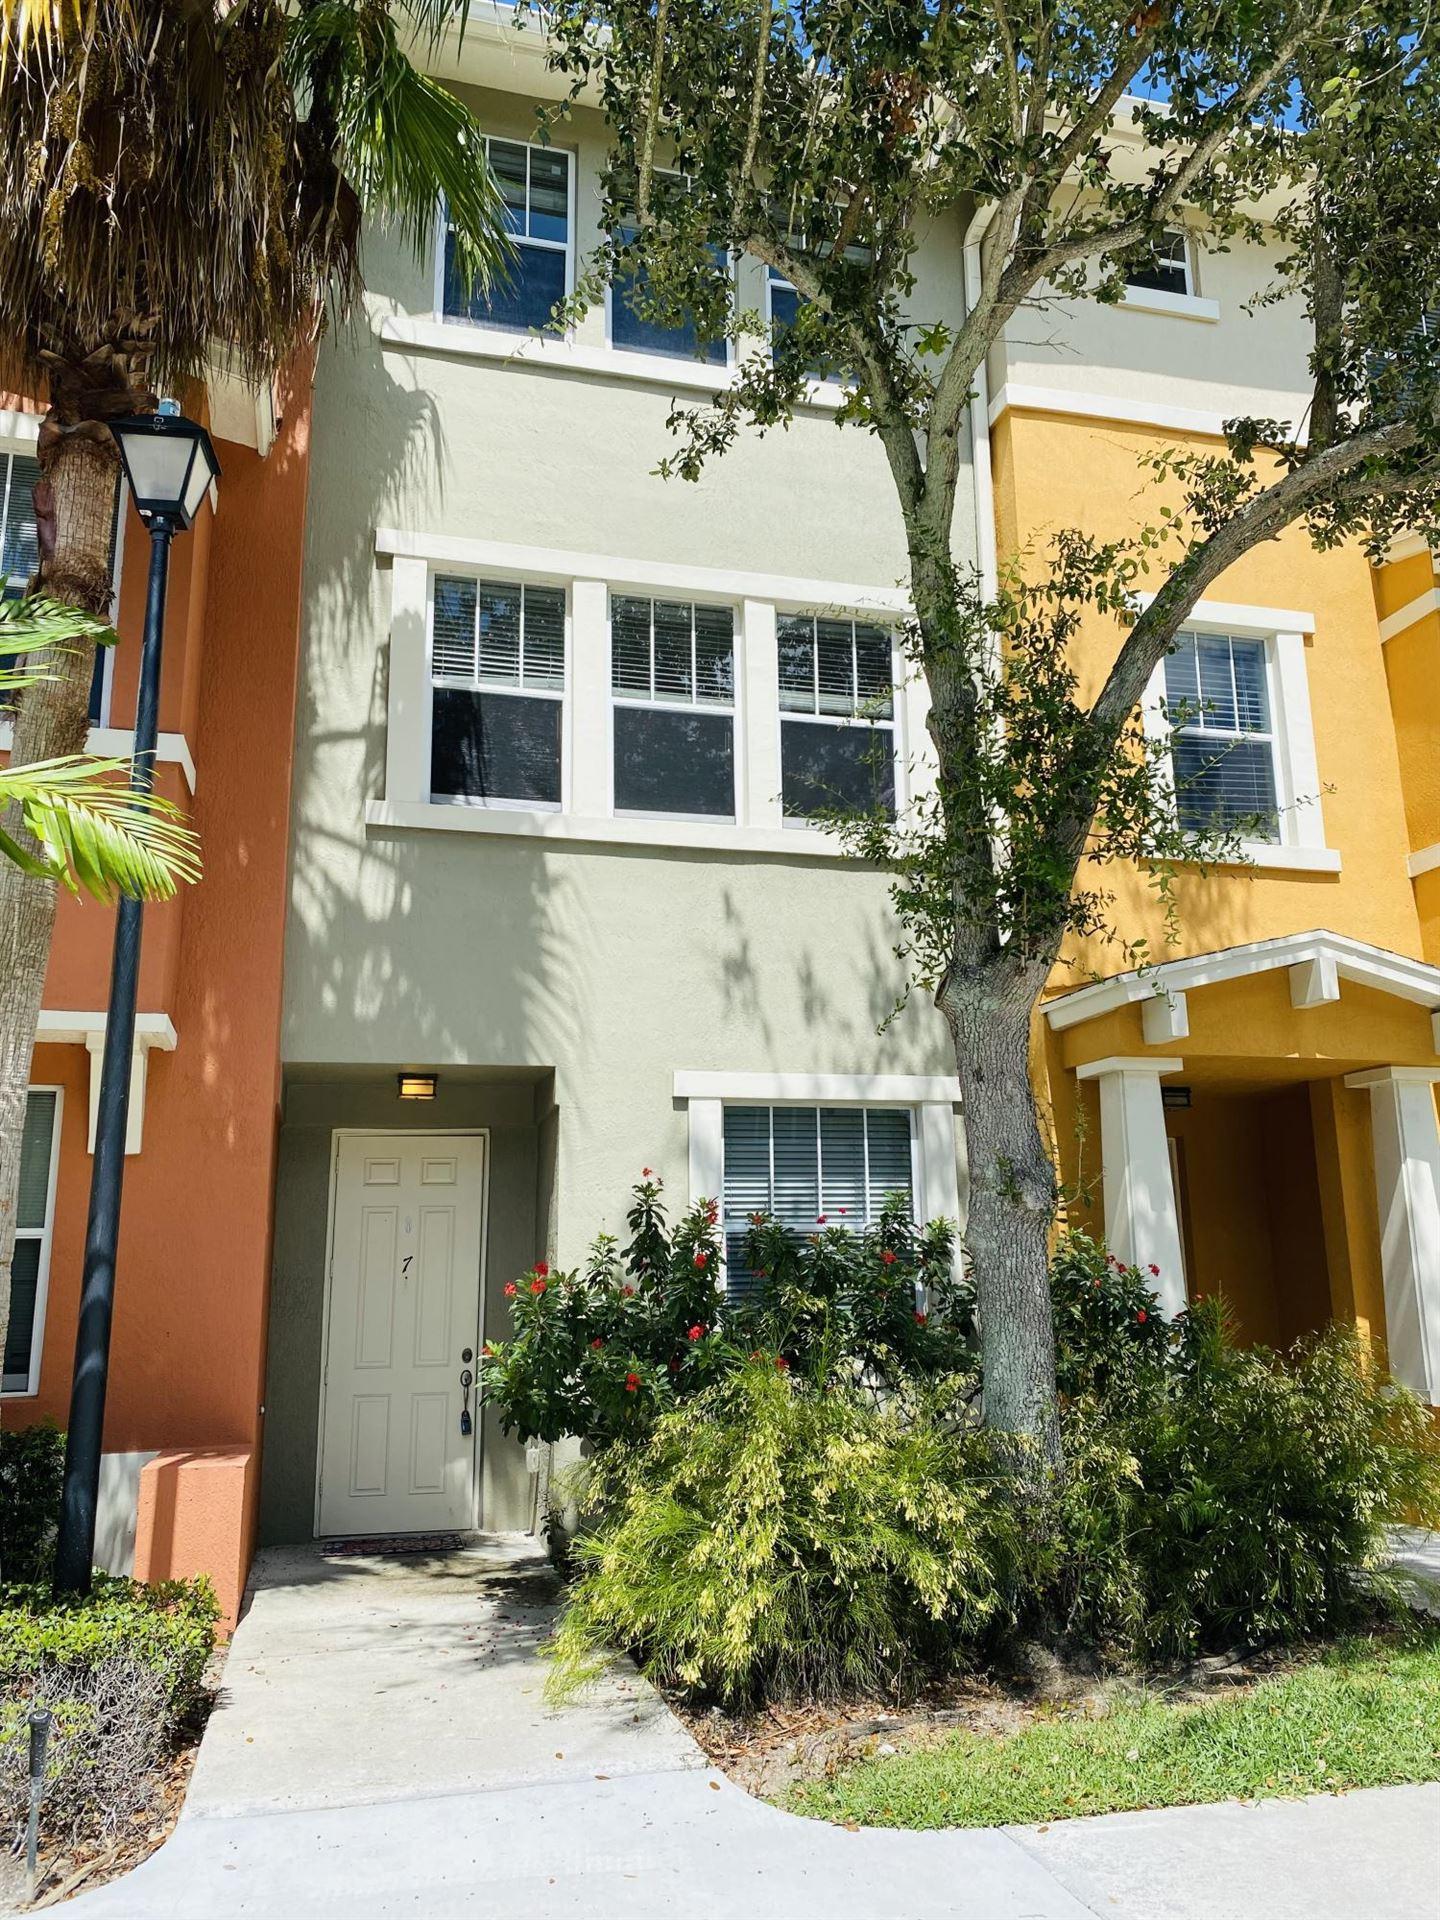 833 Millbrae Court #7, West Palm Beach, FL 33401 - MLS#: RX-10686085